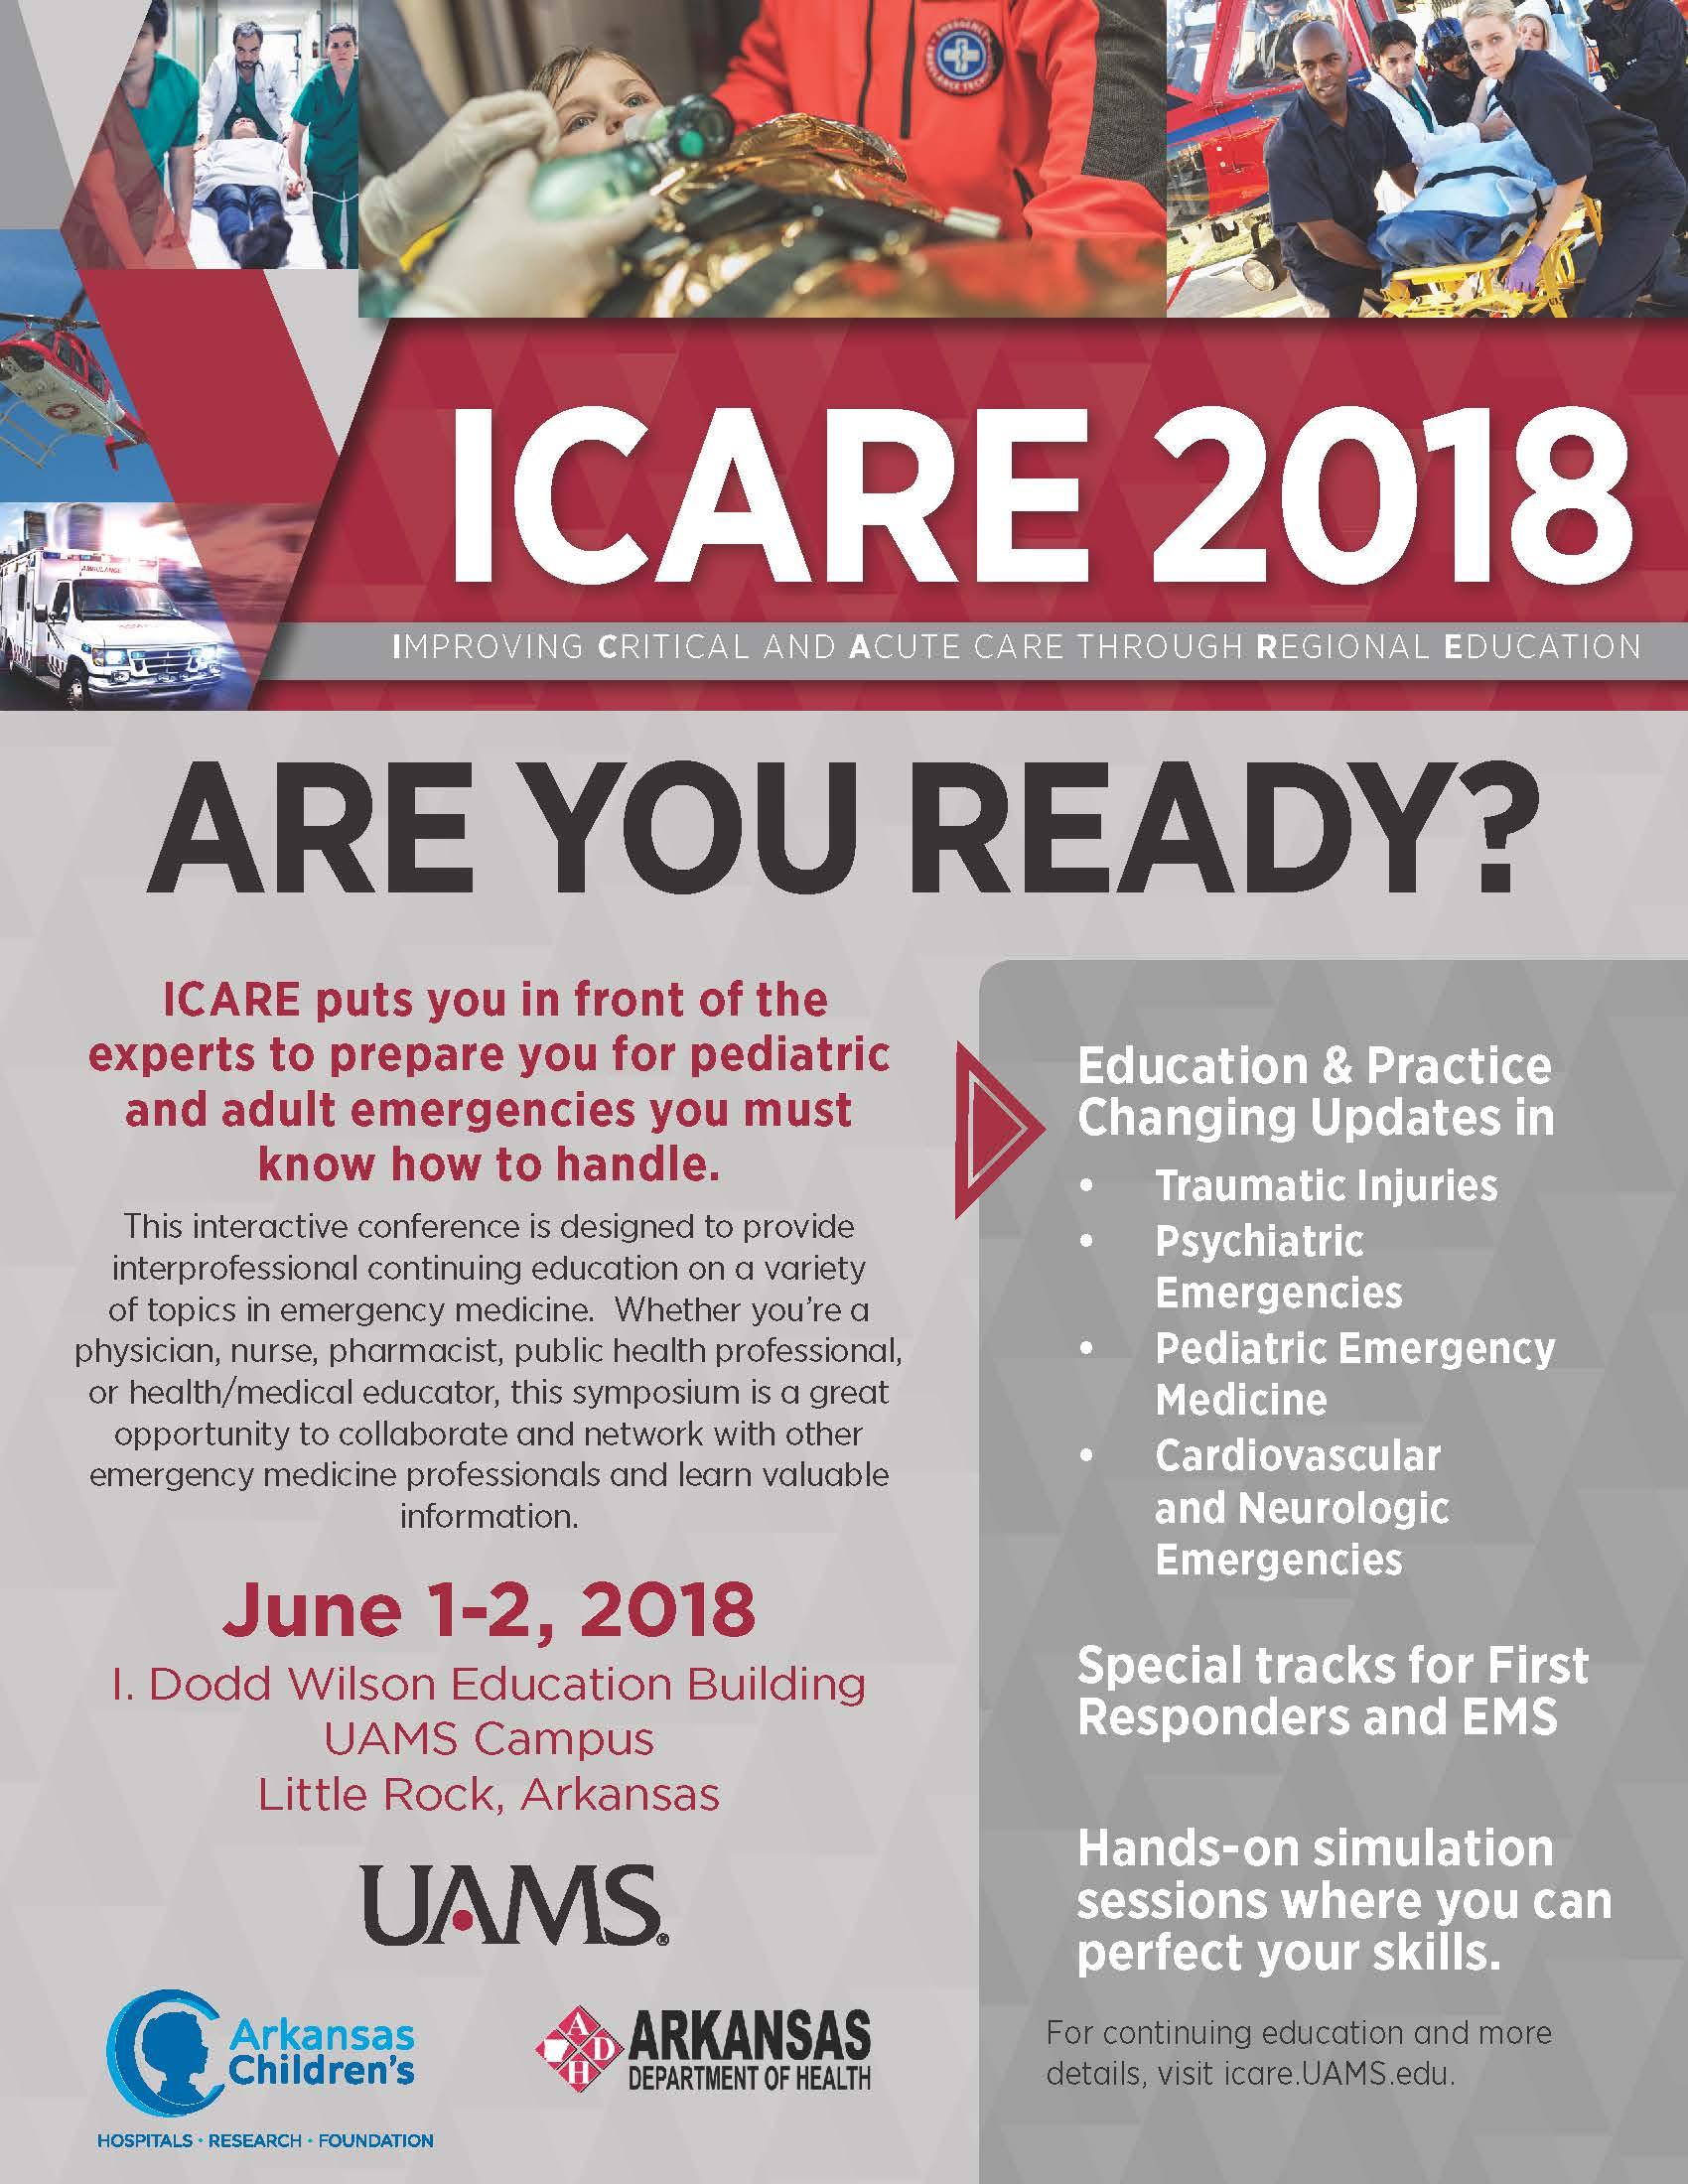 2018 Improving Critical and Acute Care through Regional